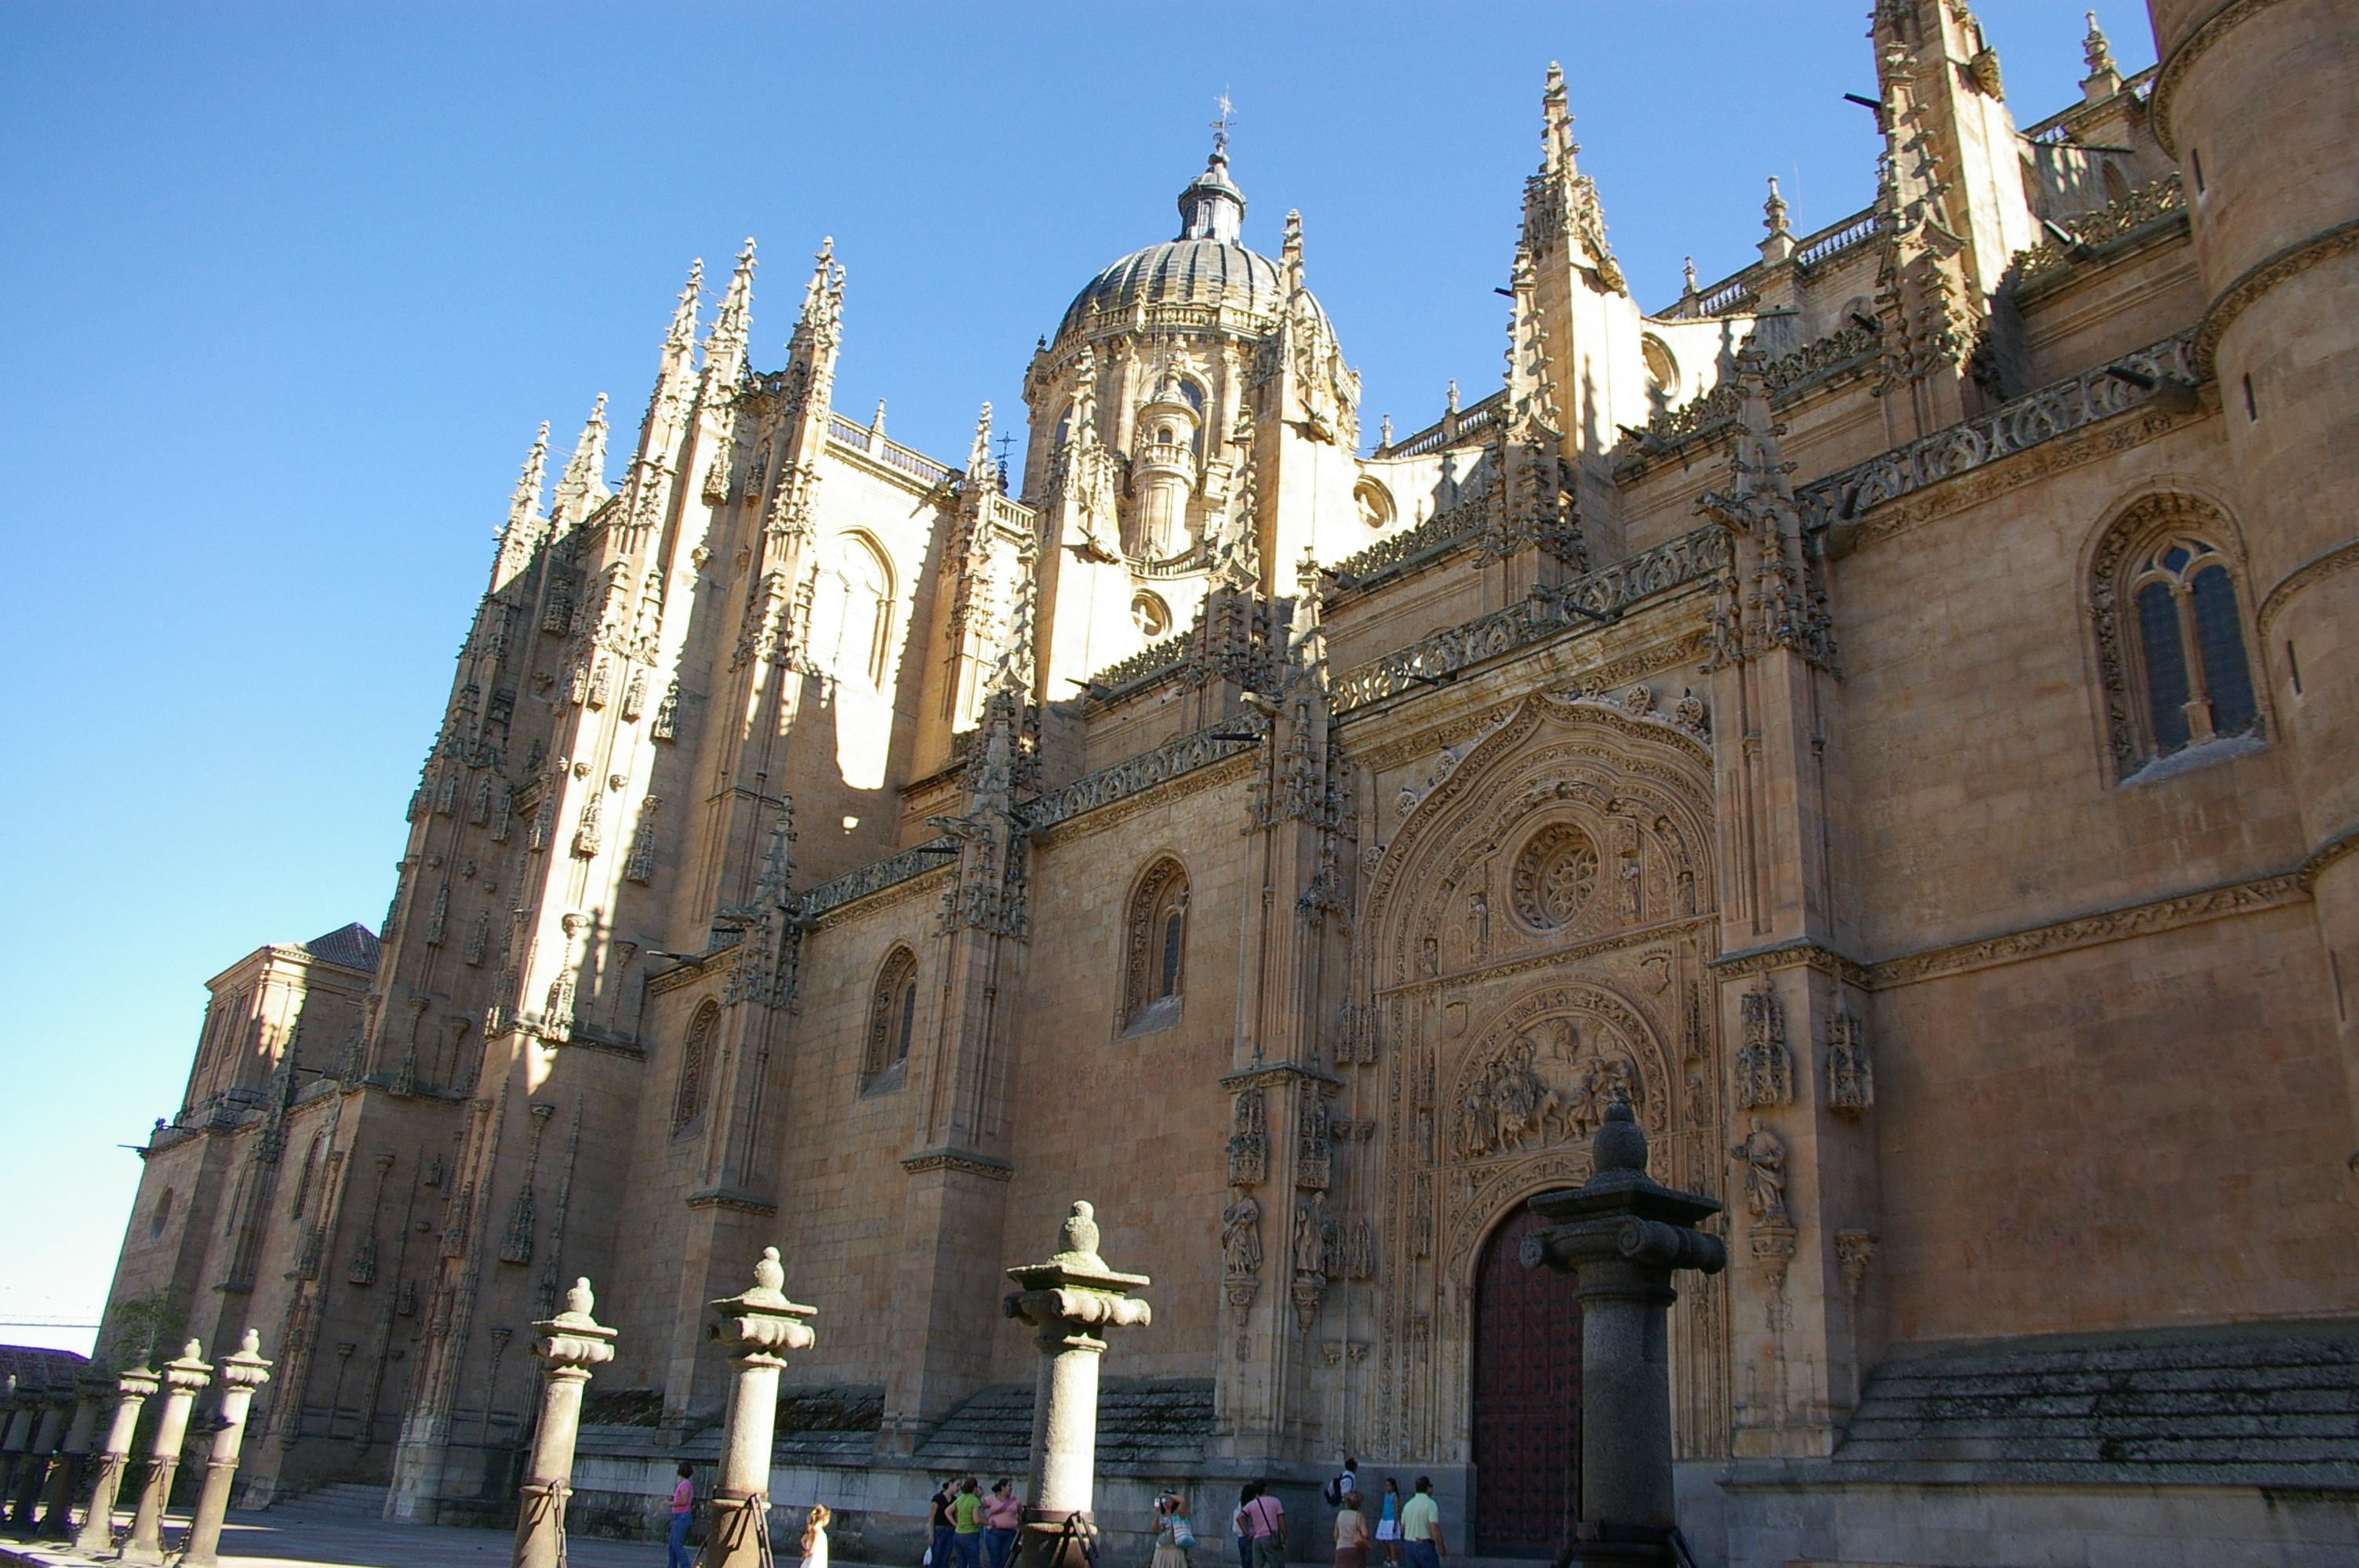 File:Salamanca - Catedral nueva (vista principal).jpg - Wikipedia